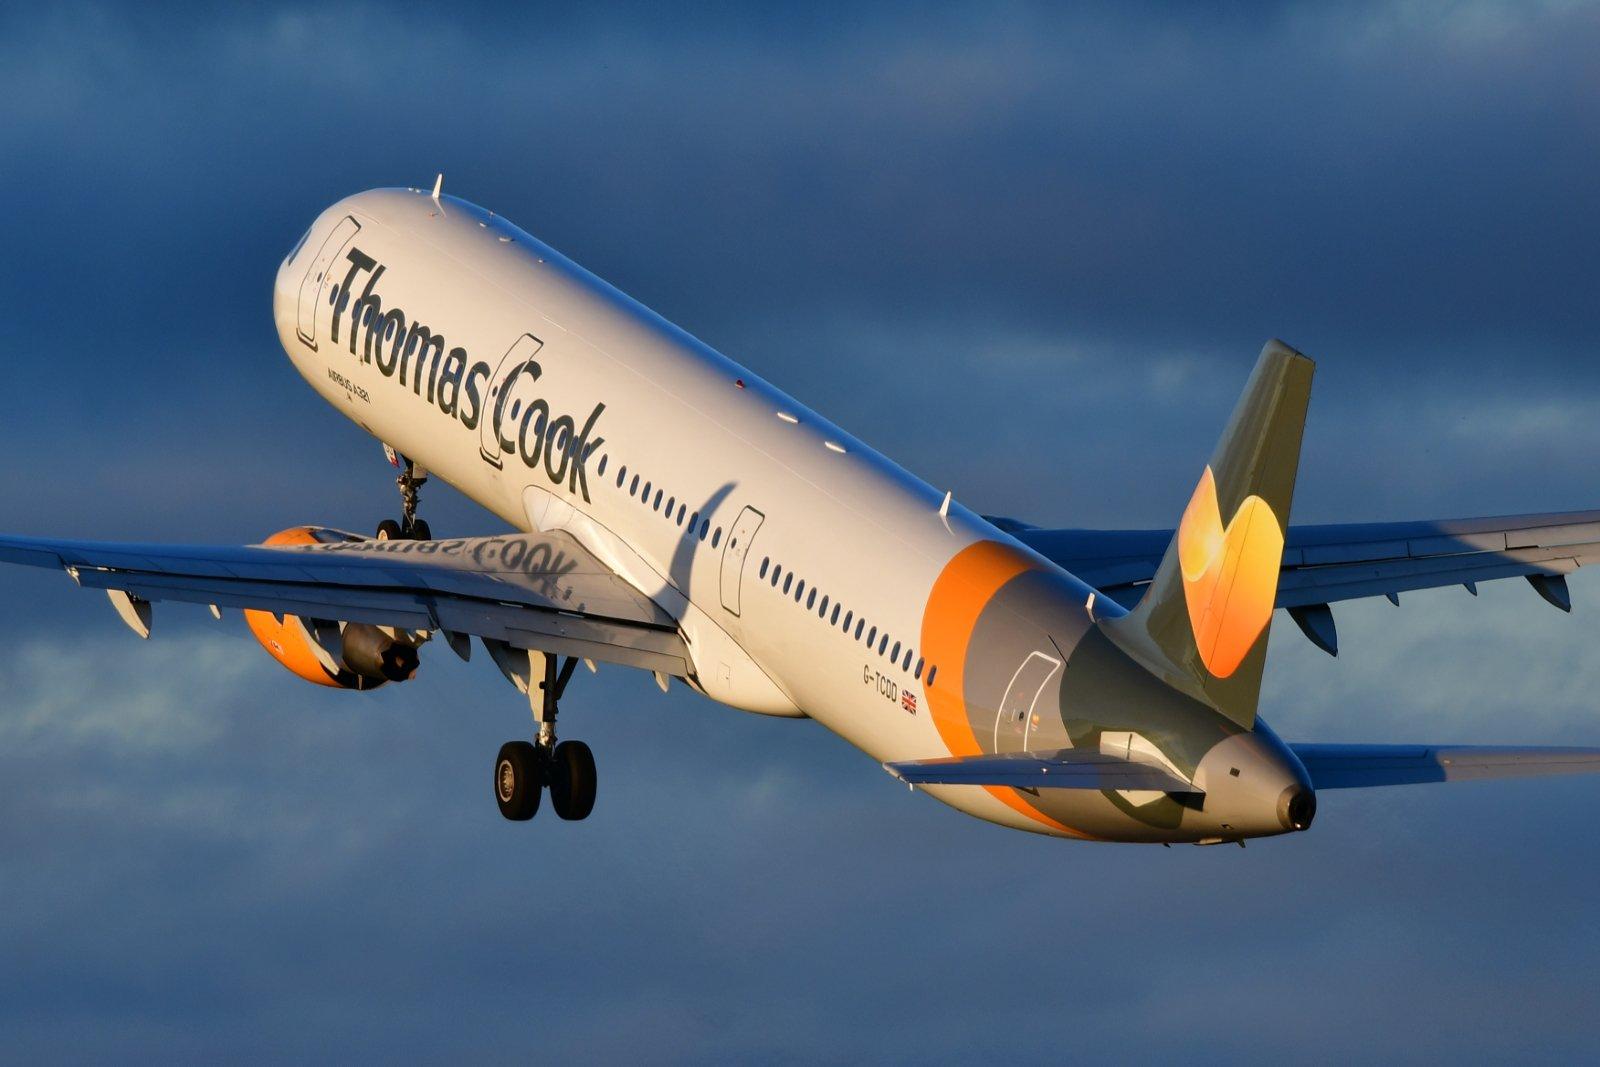 G-TCDD poistuu Las Palmasiin